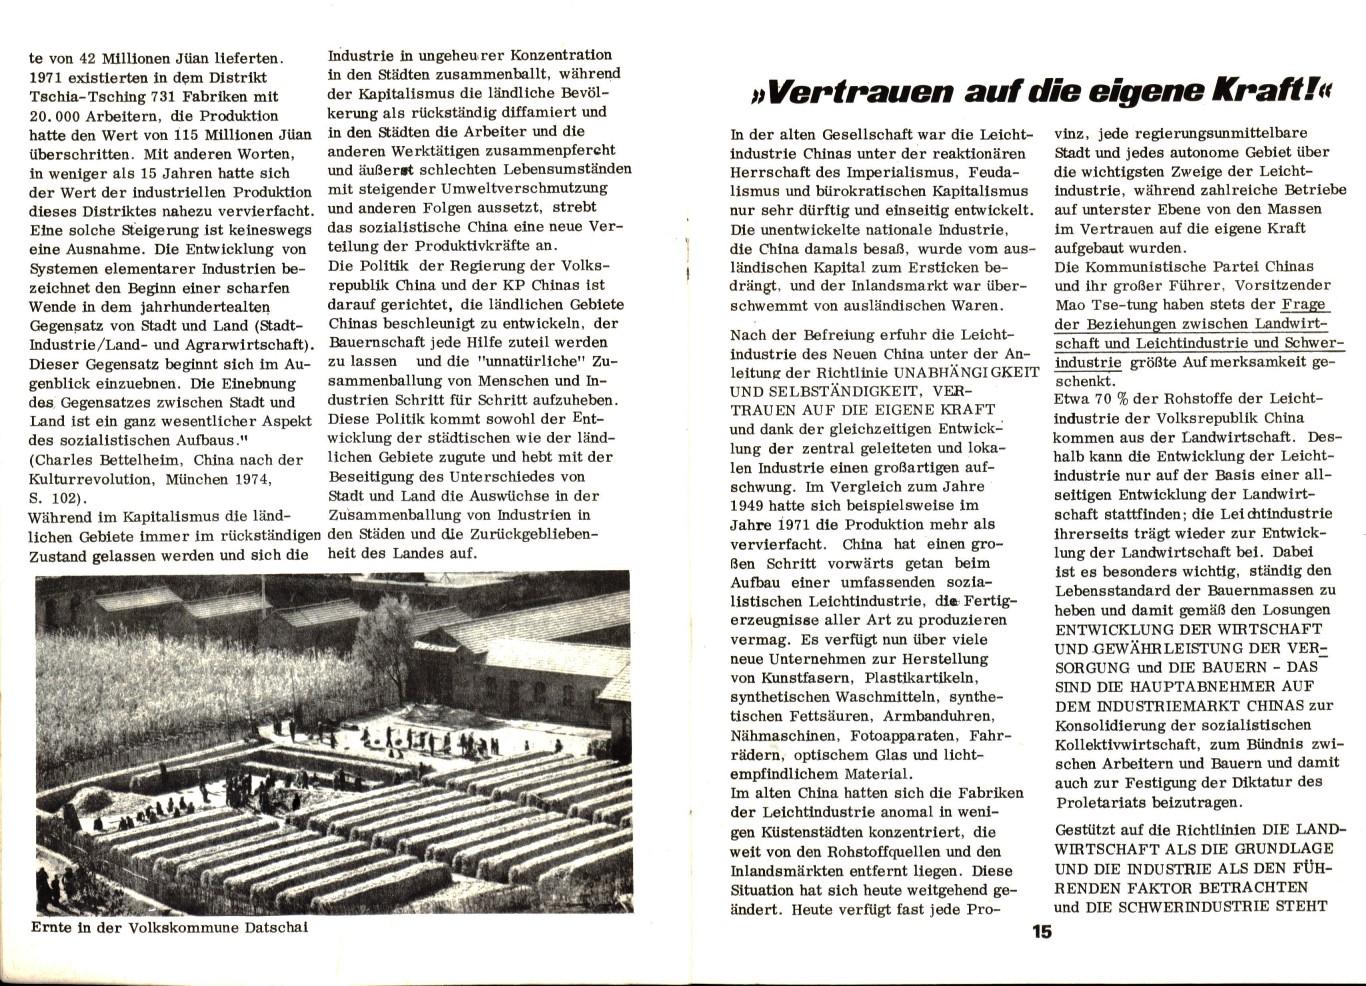 KPDAO_1975_Nationalausstellung_VRCh_in_Koeln_08